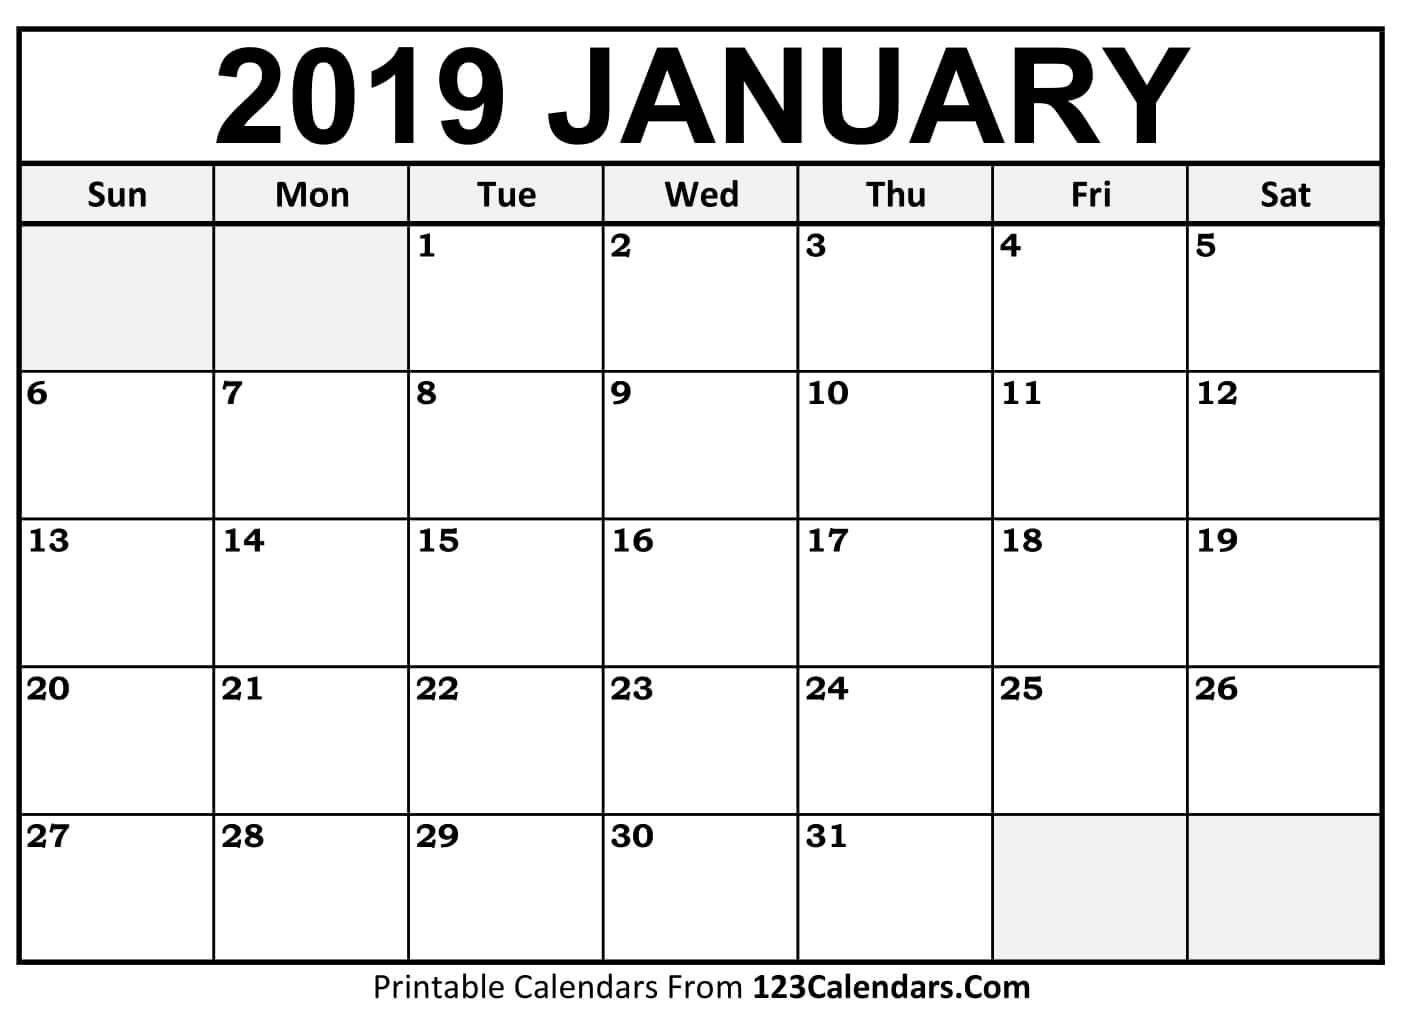 Printable January 2019 Calendar Templates – 123Calendars January 2 2019 Calendar